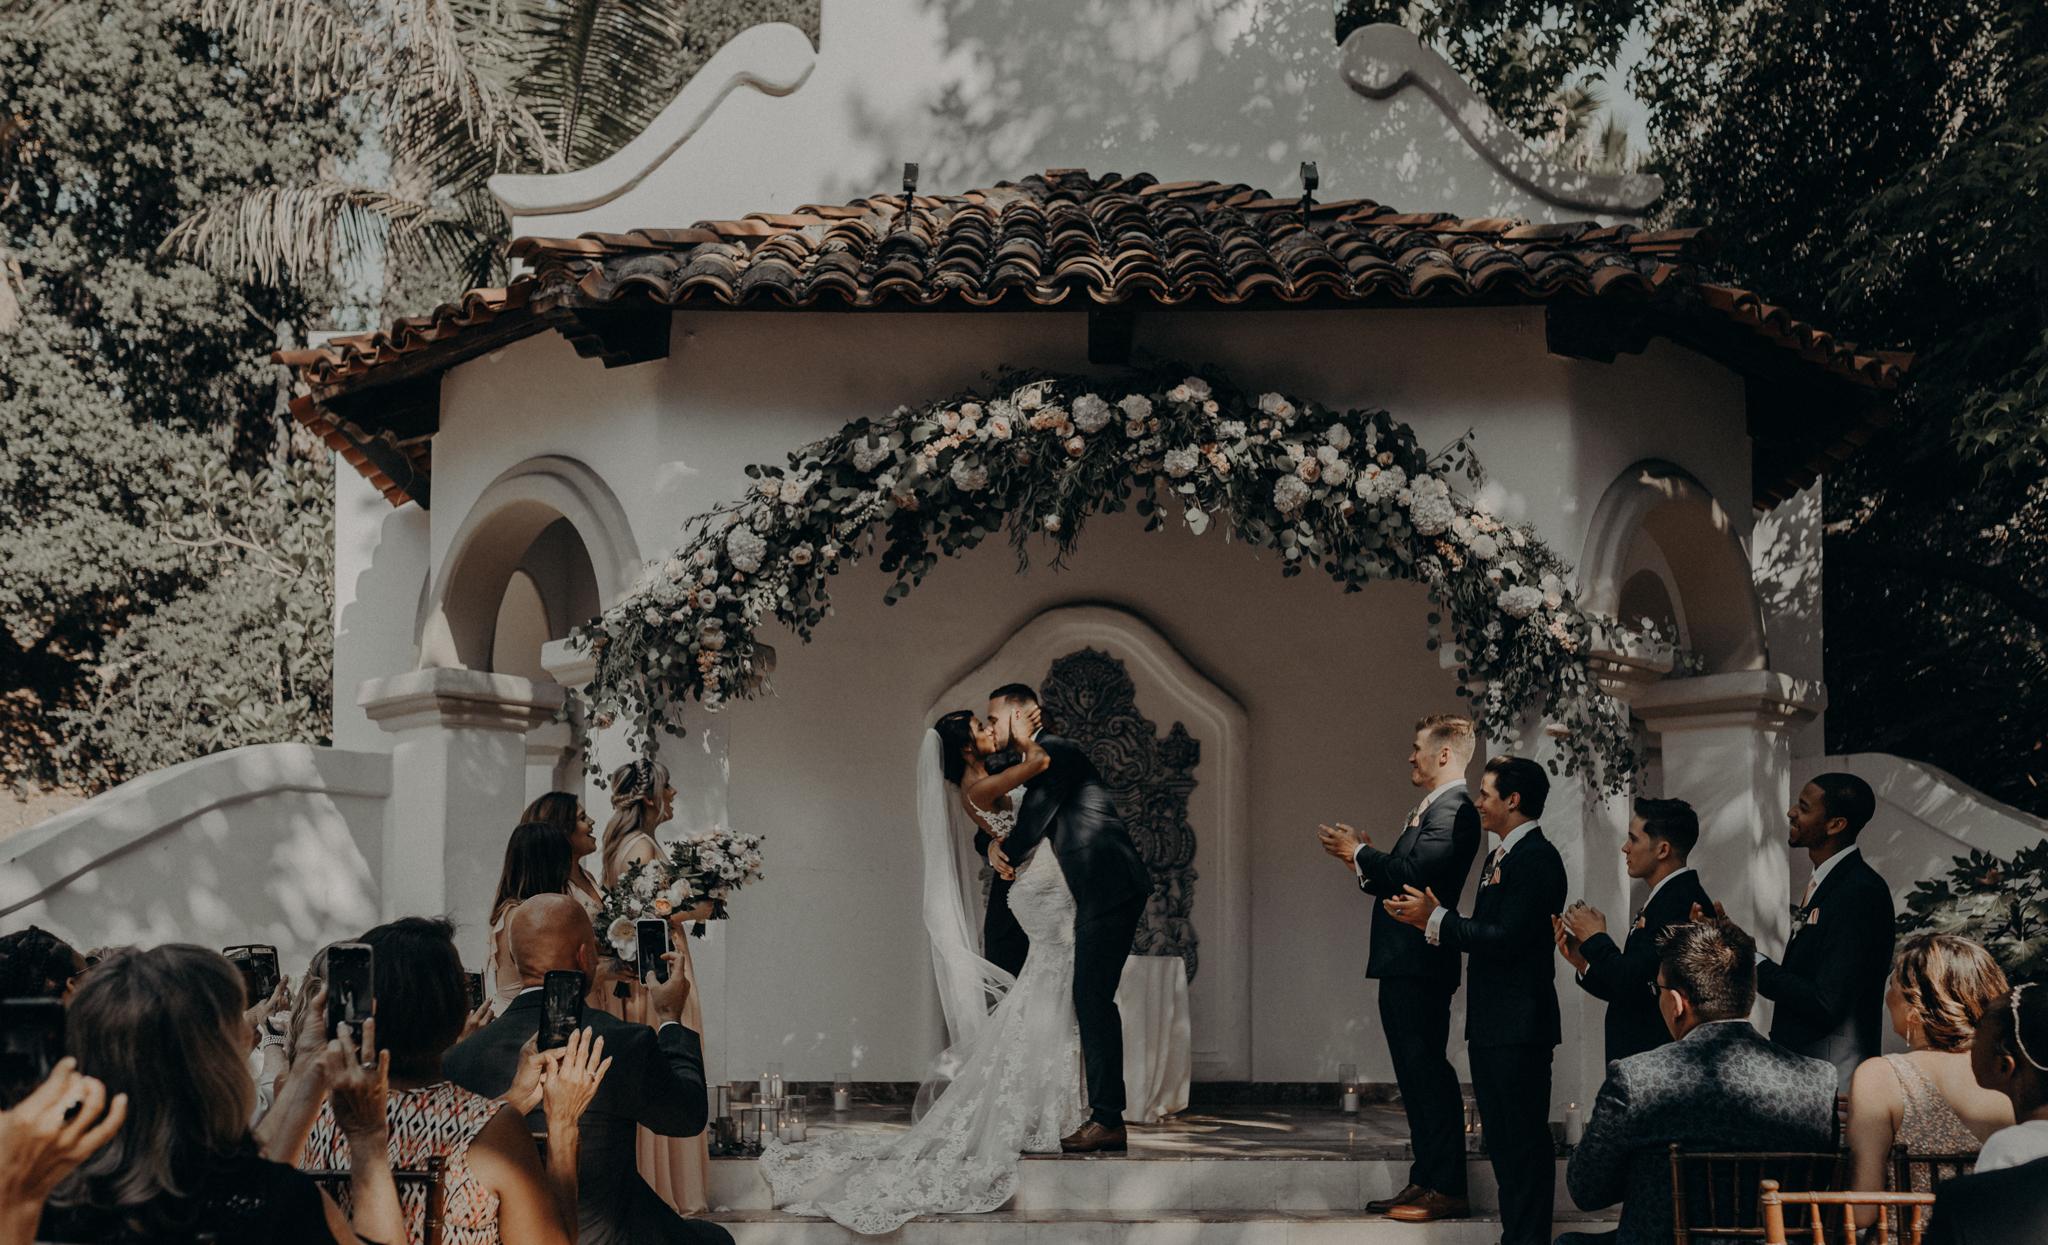 Isaiah + Taylor Photography - Rancho Las Lomas Wedding, Los Angeles Wedding Photographer-063.jpg